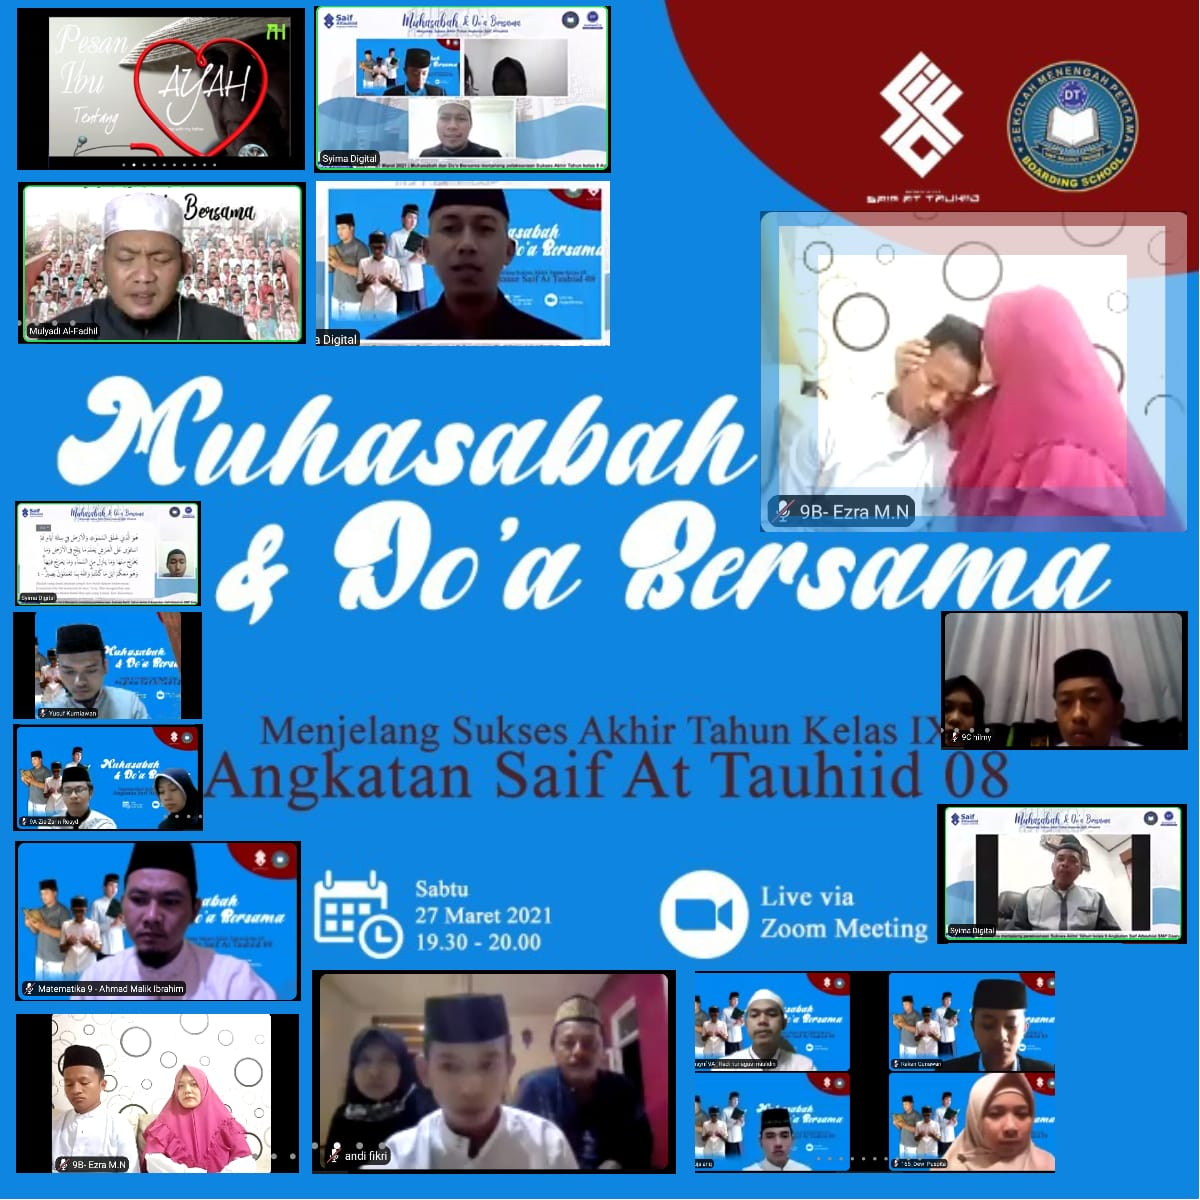 Jelang Ujian Sekolah, SMP Daarut Tauhiid Boarding School Gelar Muhasabah dan Doa Bersama